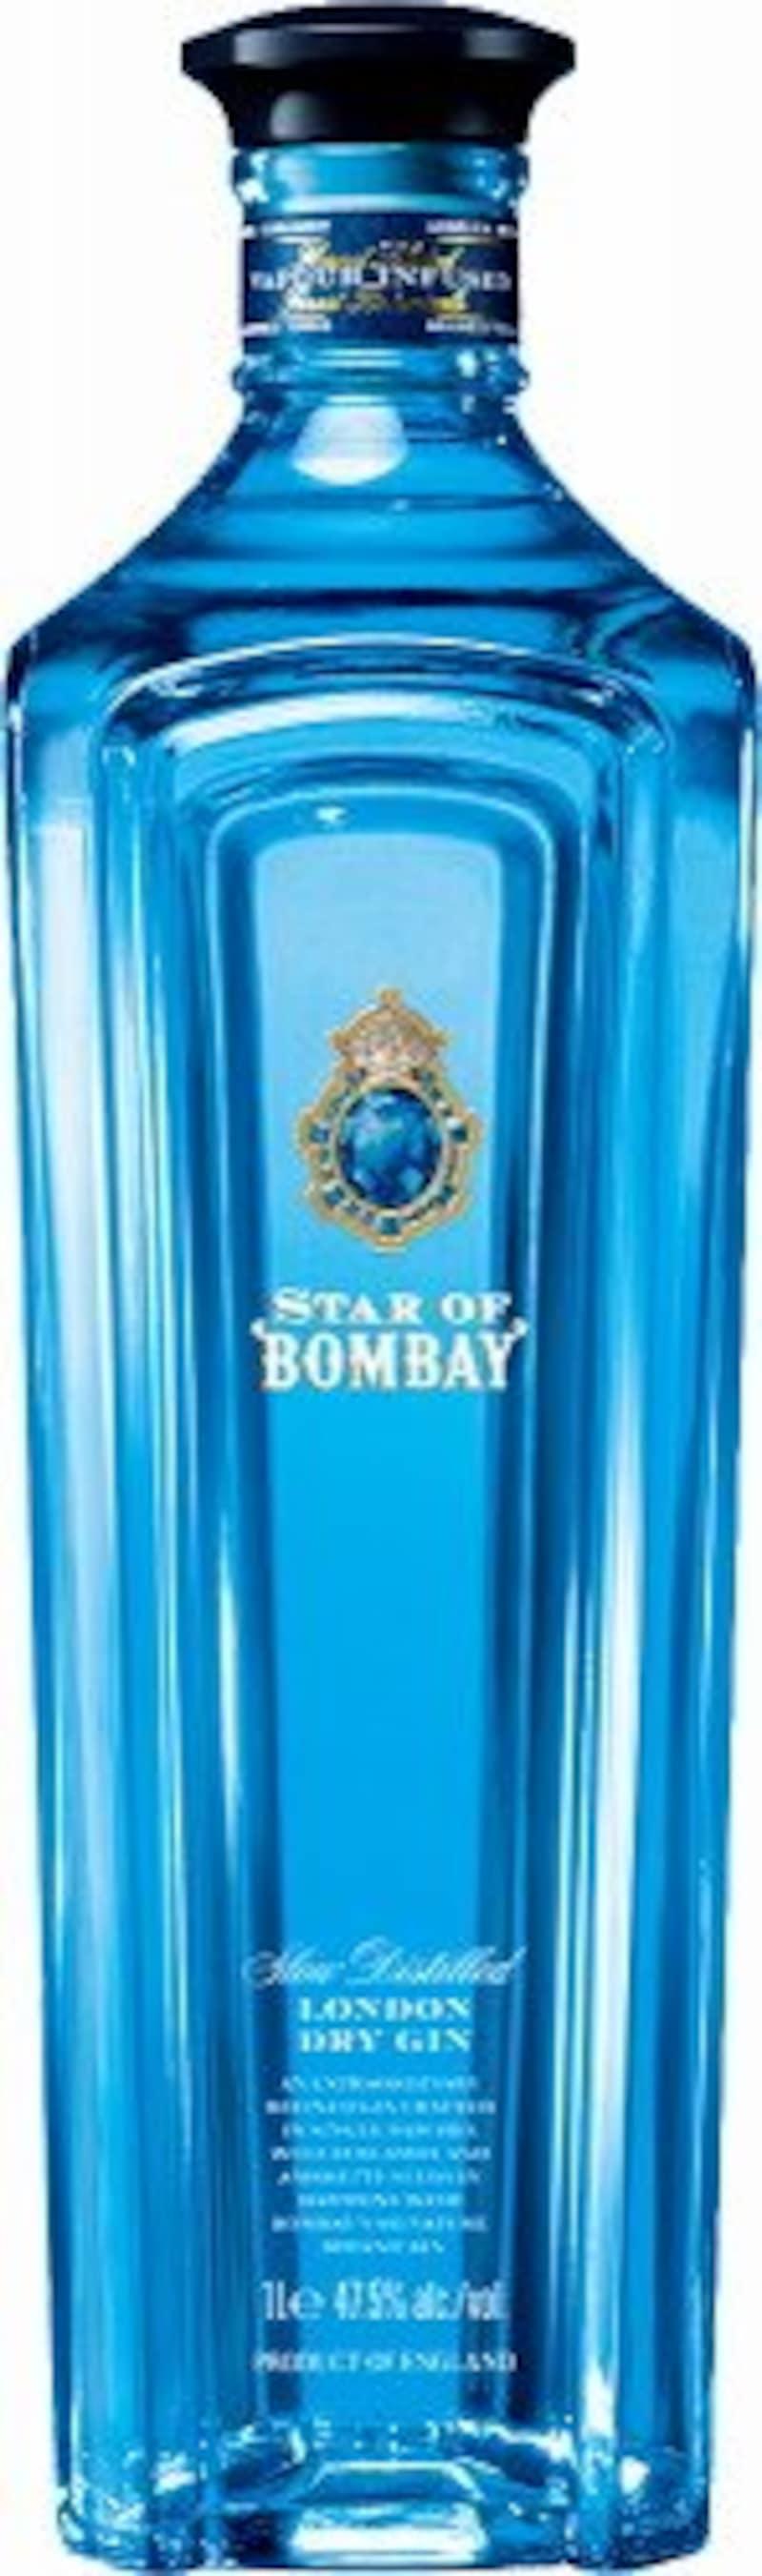 BOMBAY SAPPHIRE(ボンベイ・サファイア),スター・オブ・ボンベイ,-